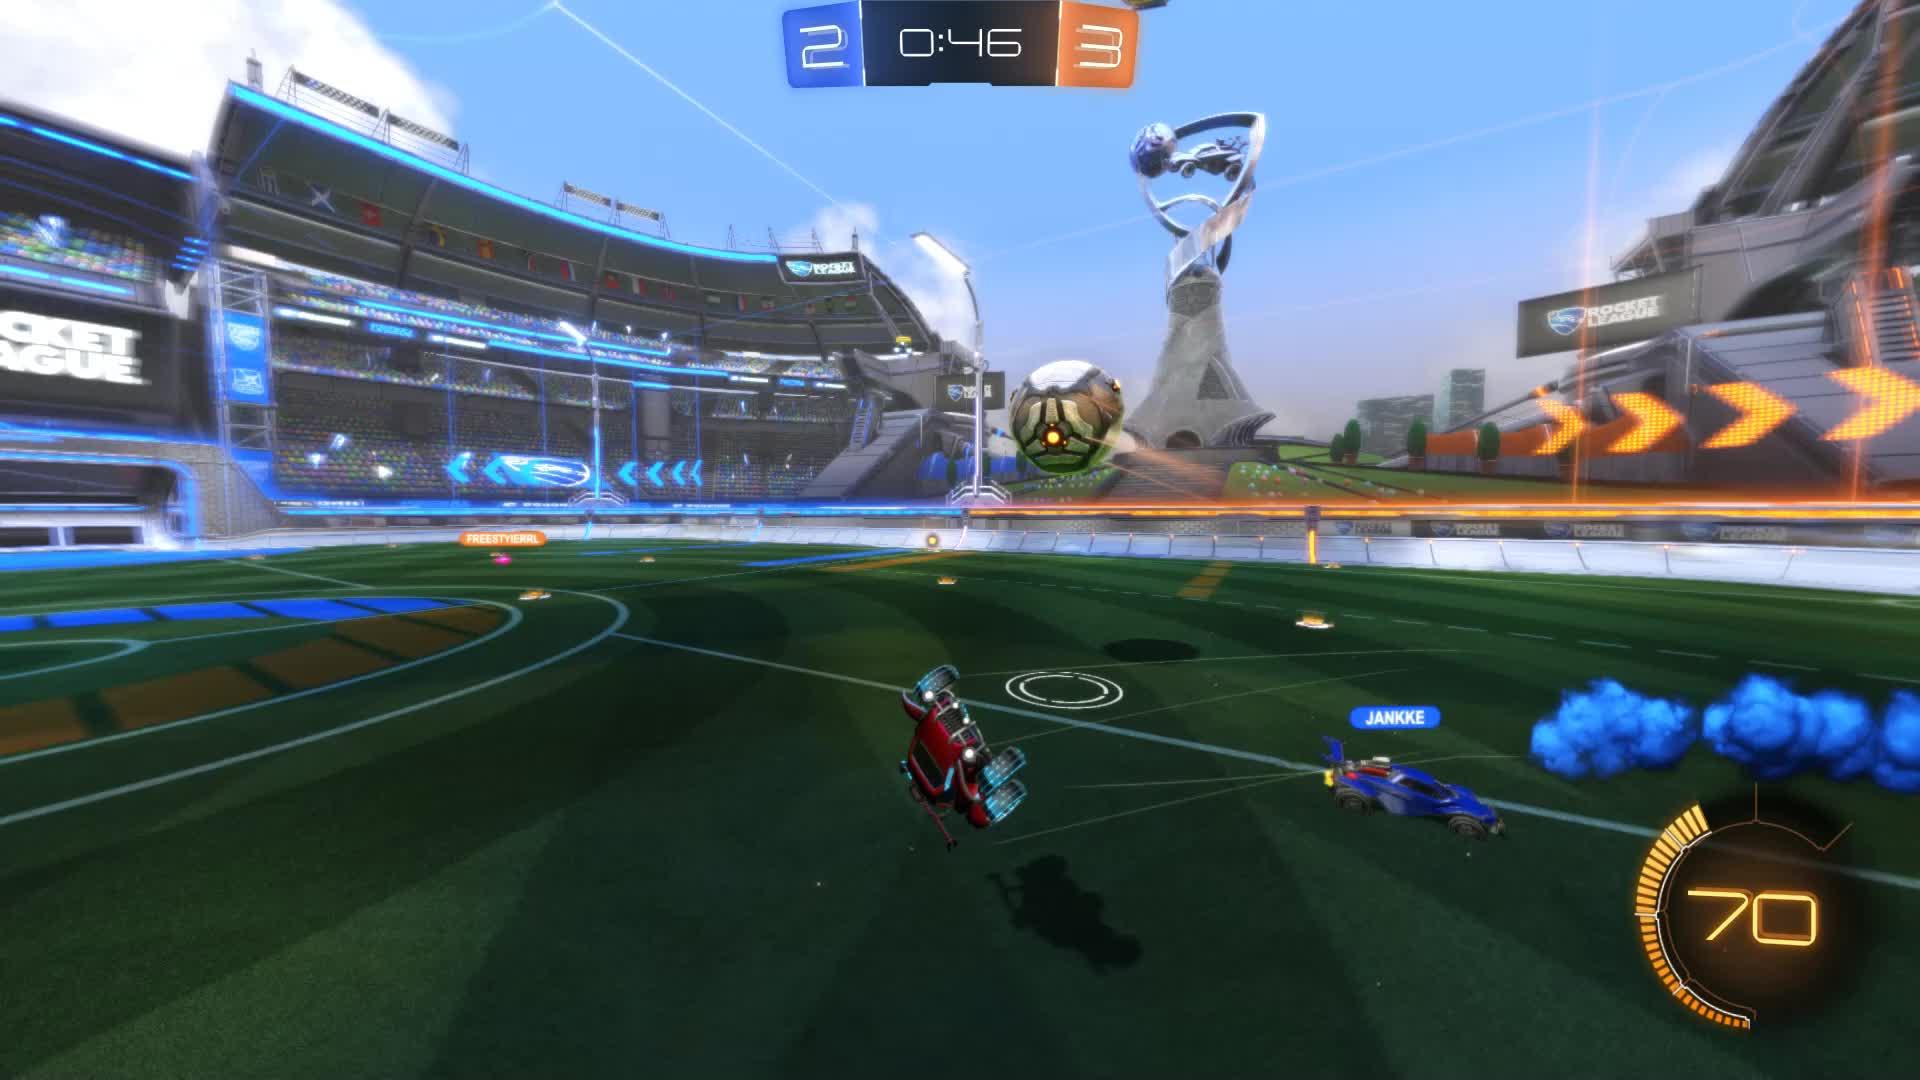 Gif Your Game, GifYourGame, Goal, JAG, Rocket League, RocketLeague, Goal 6: JAG GIFs